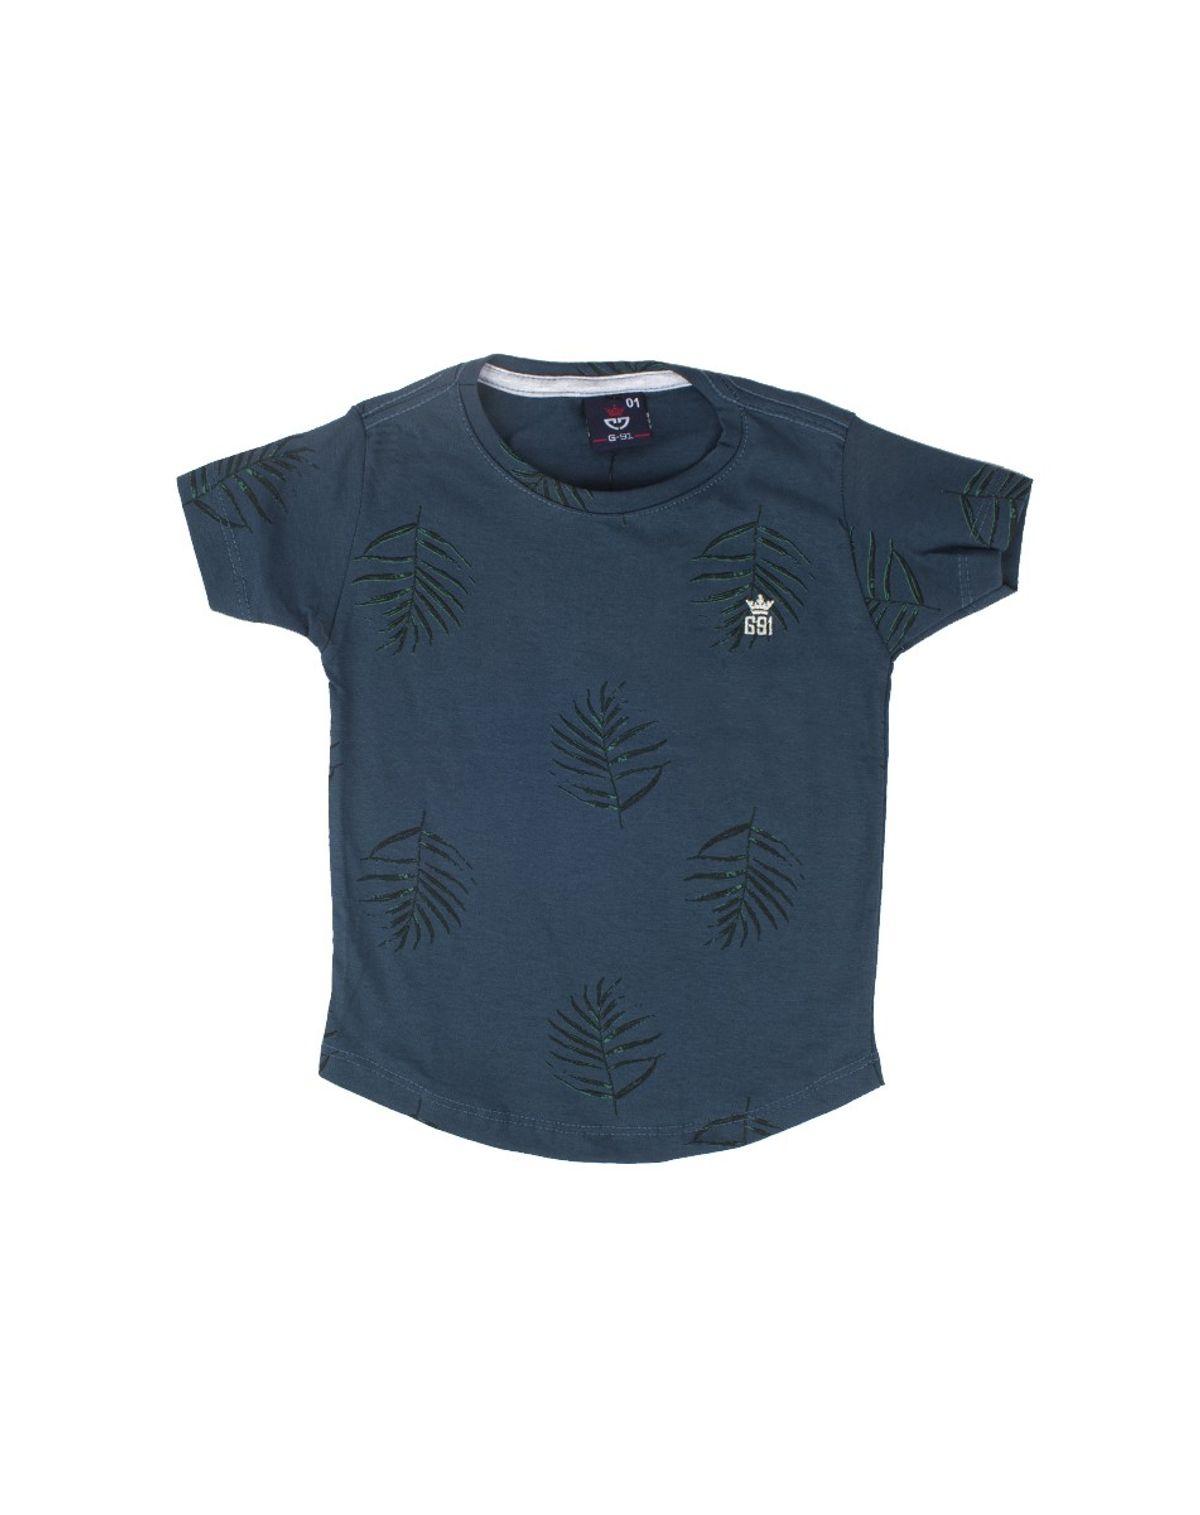 2050005681399-Camiseta-Bebe-Menino-Longline-Estampa-Folhagem-MARINHO-1-1